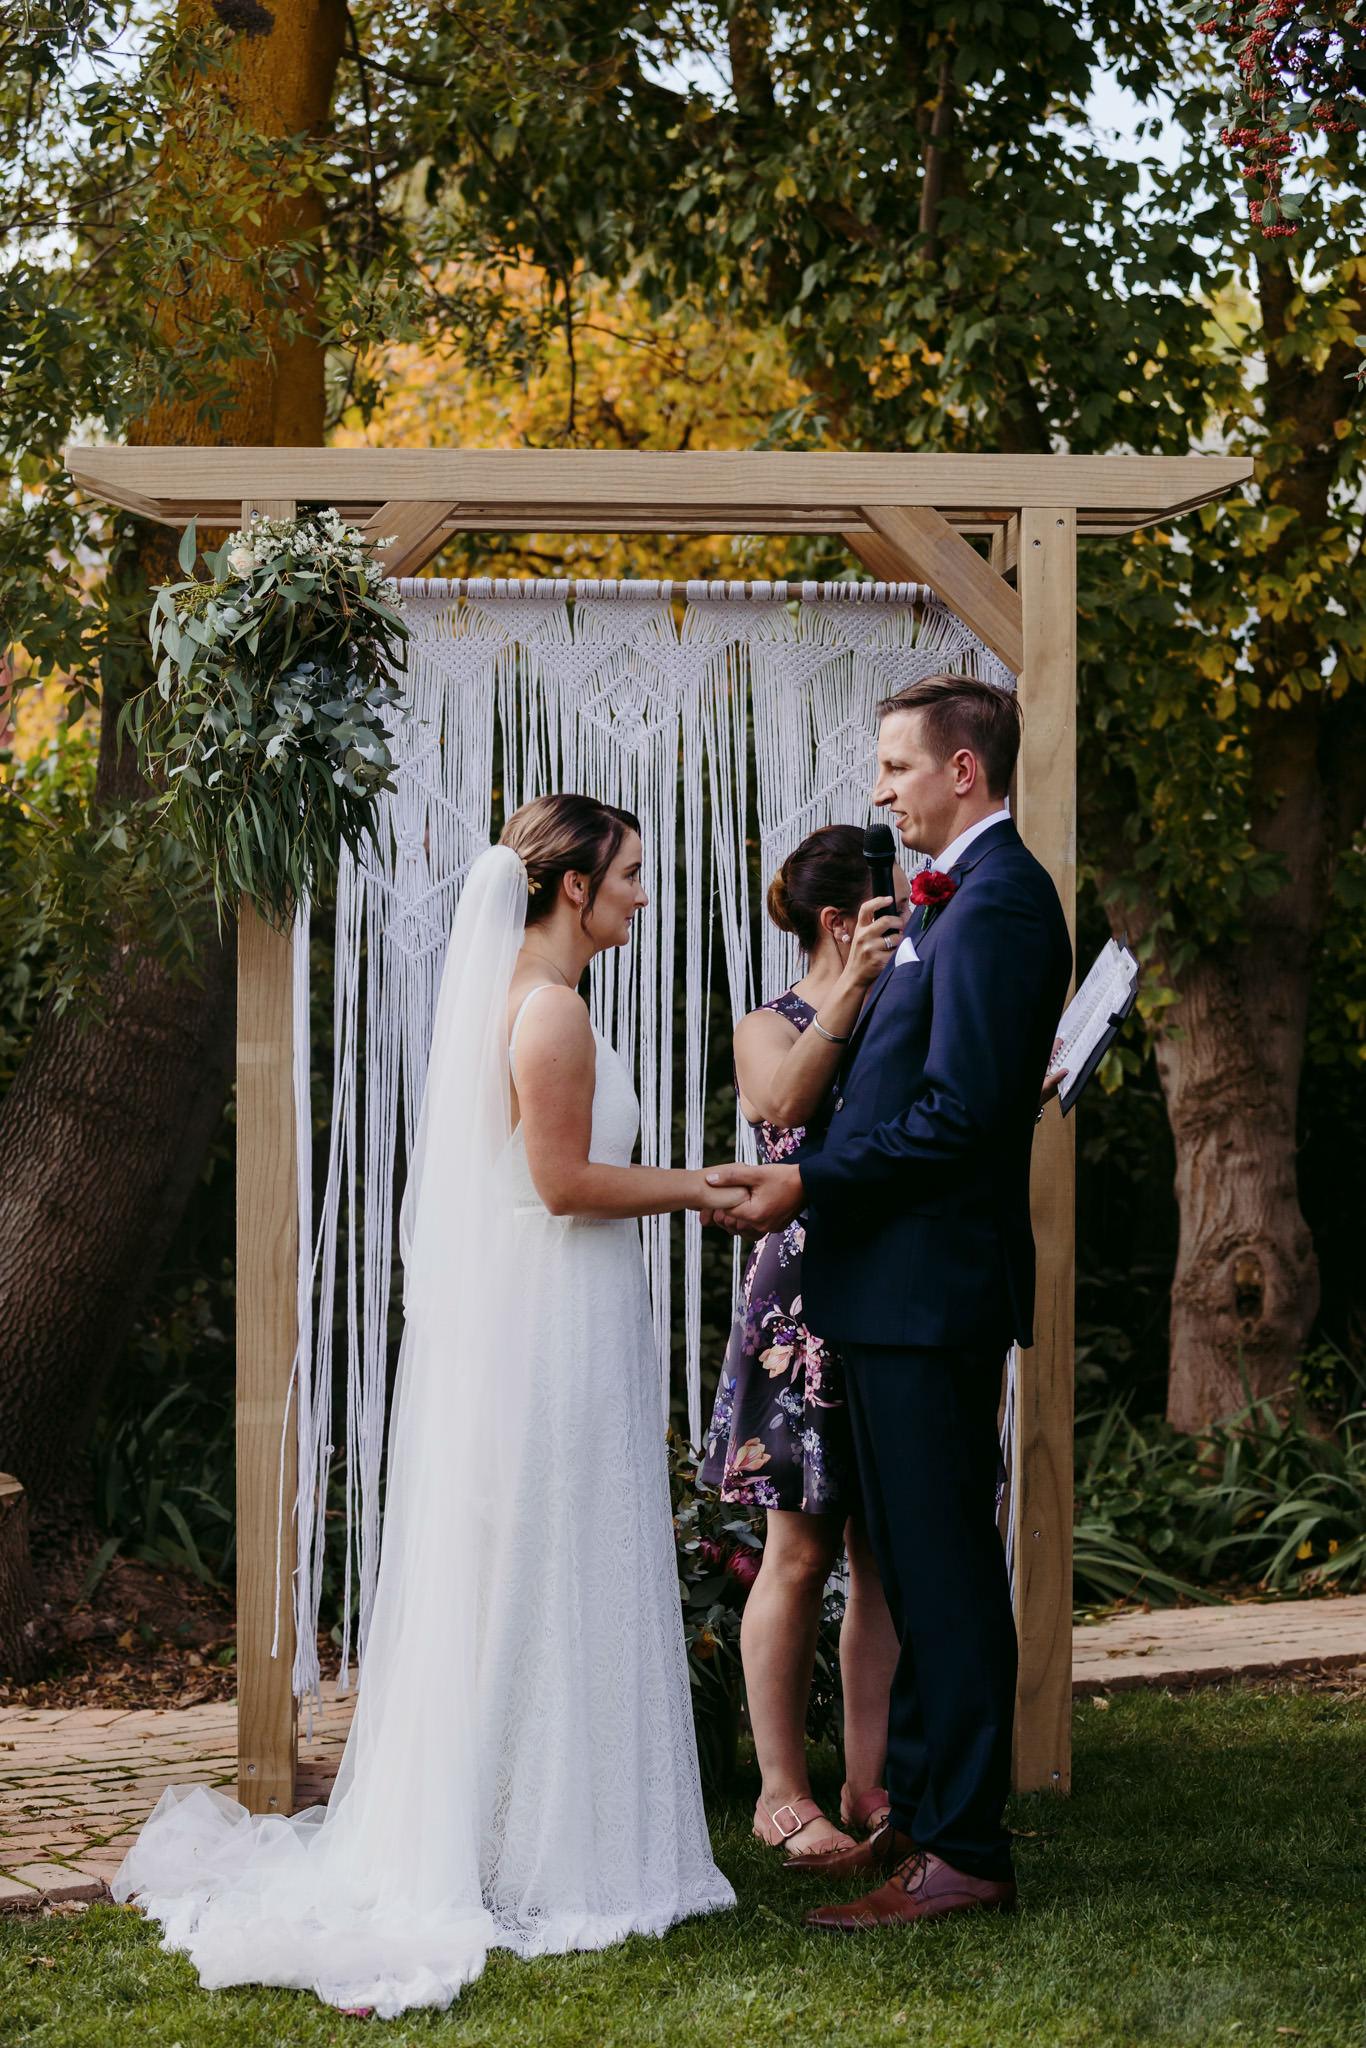 Erin Latimore Mudgee Canberra Wedding Photographer ROSEBANK GUESTHOUSE OLD THEATRE TONIC MILLTHORPE_247.JPG